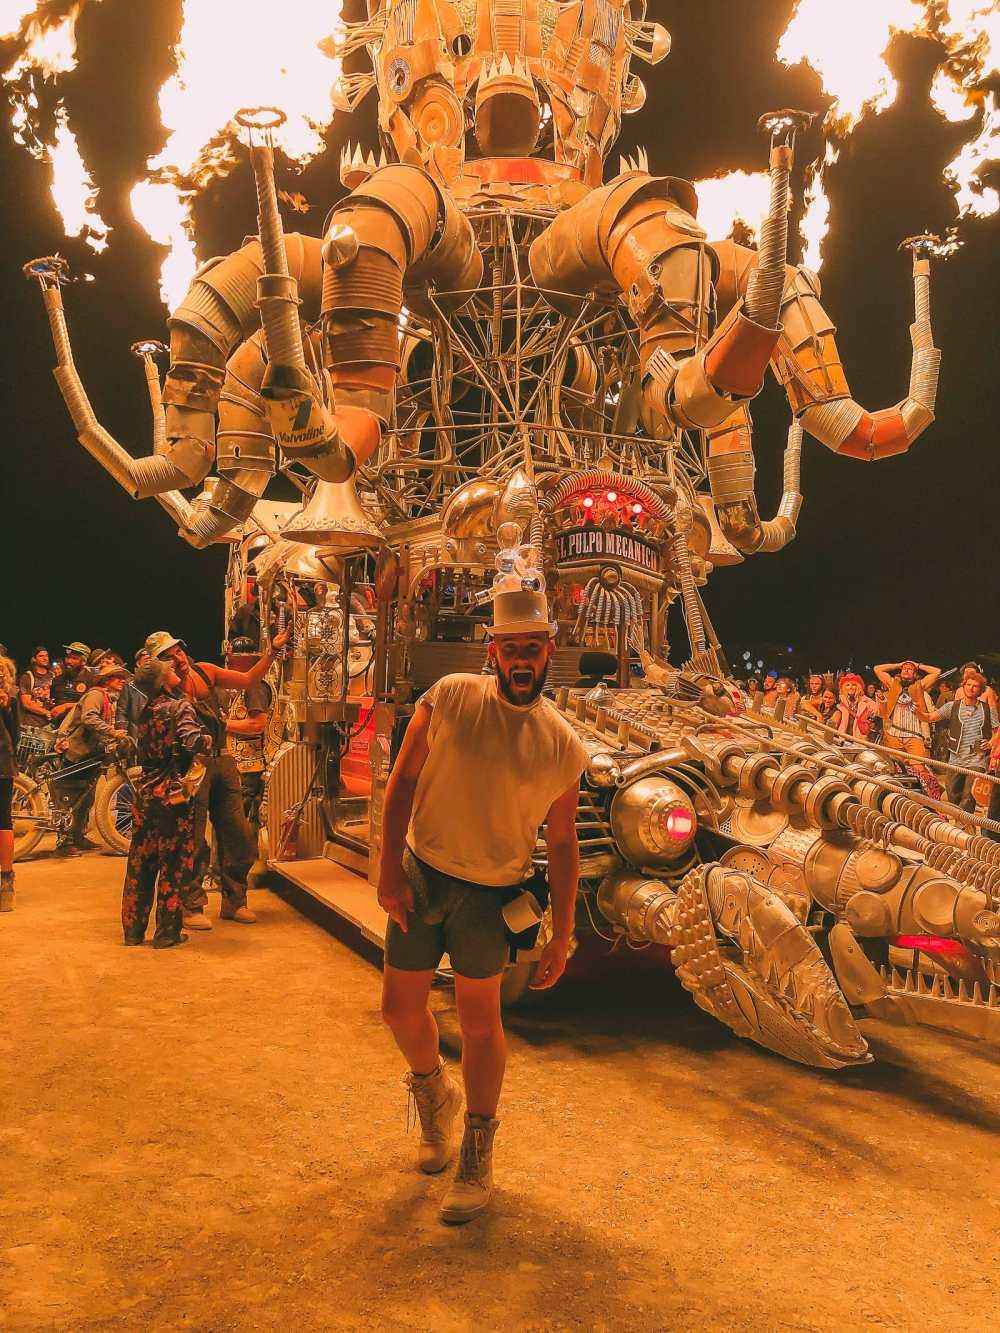 Руководство для новичков по Burning Man (35)